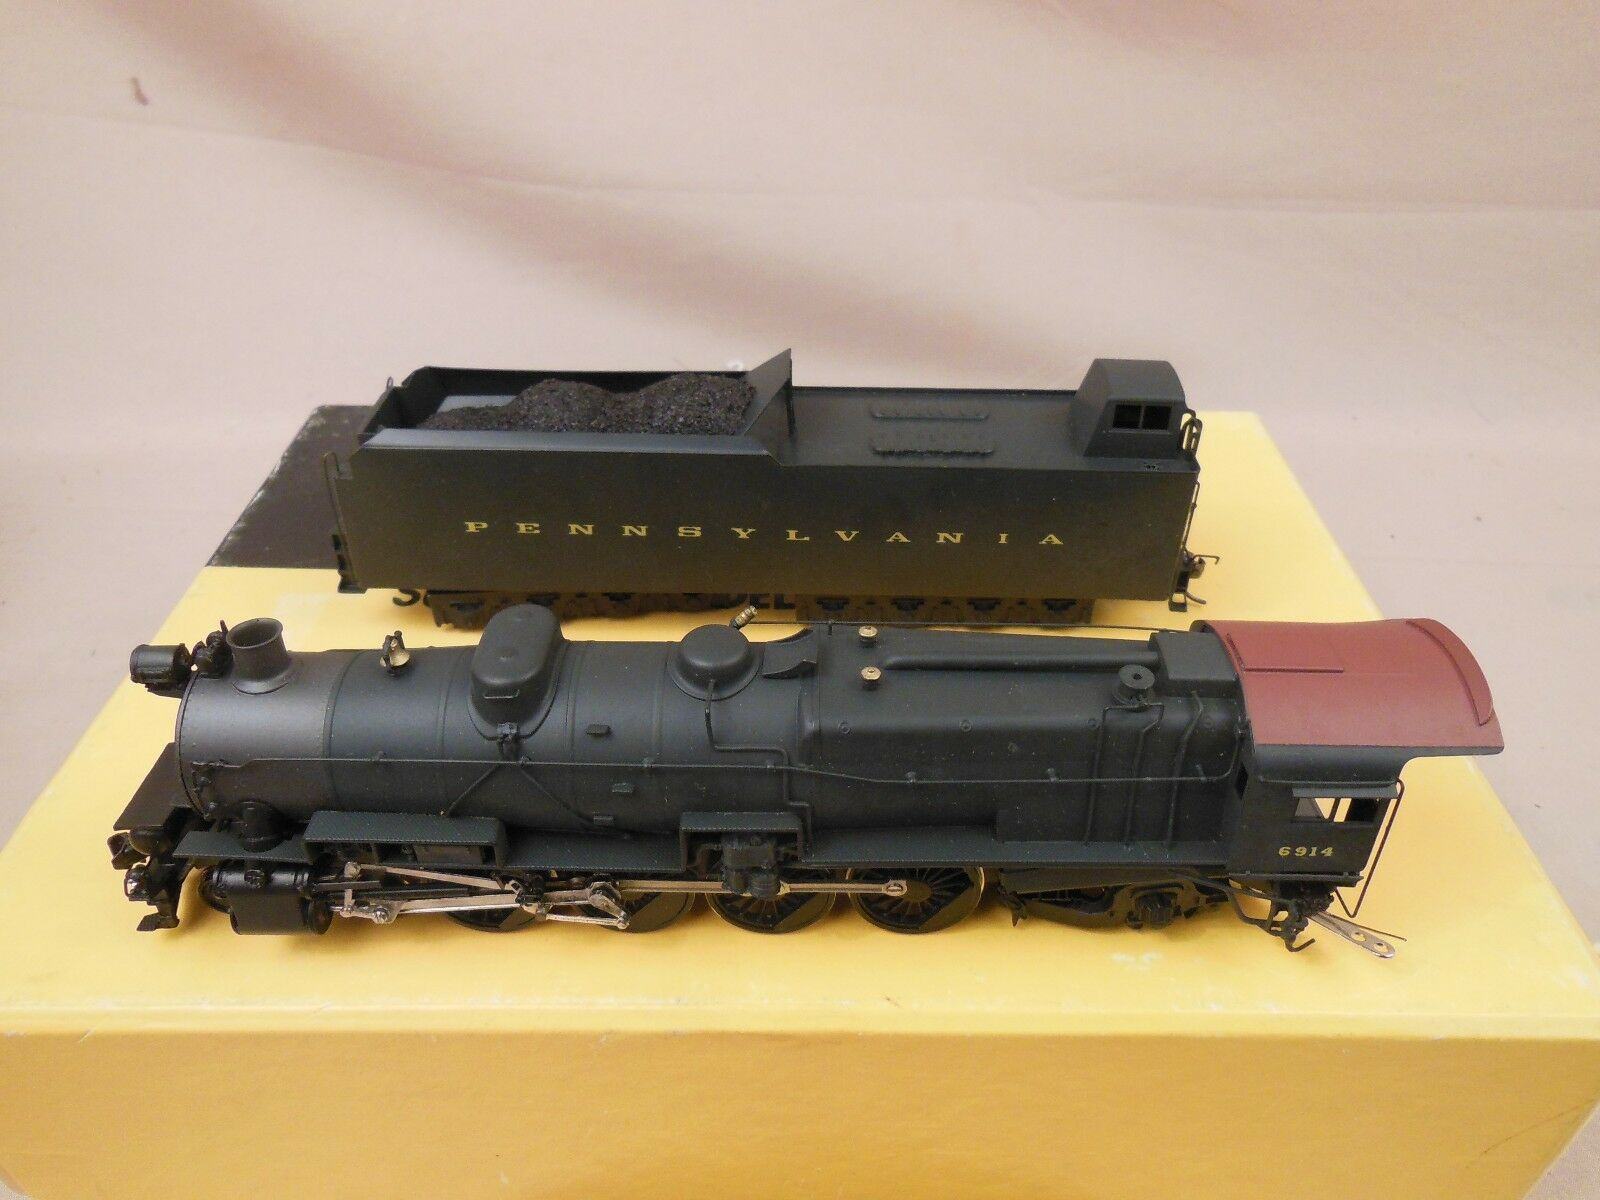 HO BRASS SUNSET Models  RER 4-8-2 M-1 Locomotive  prix bas 40%